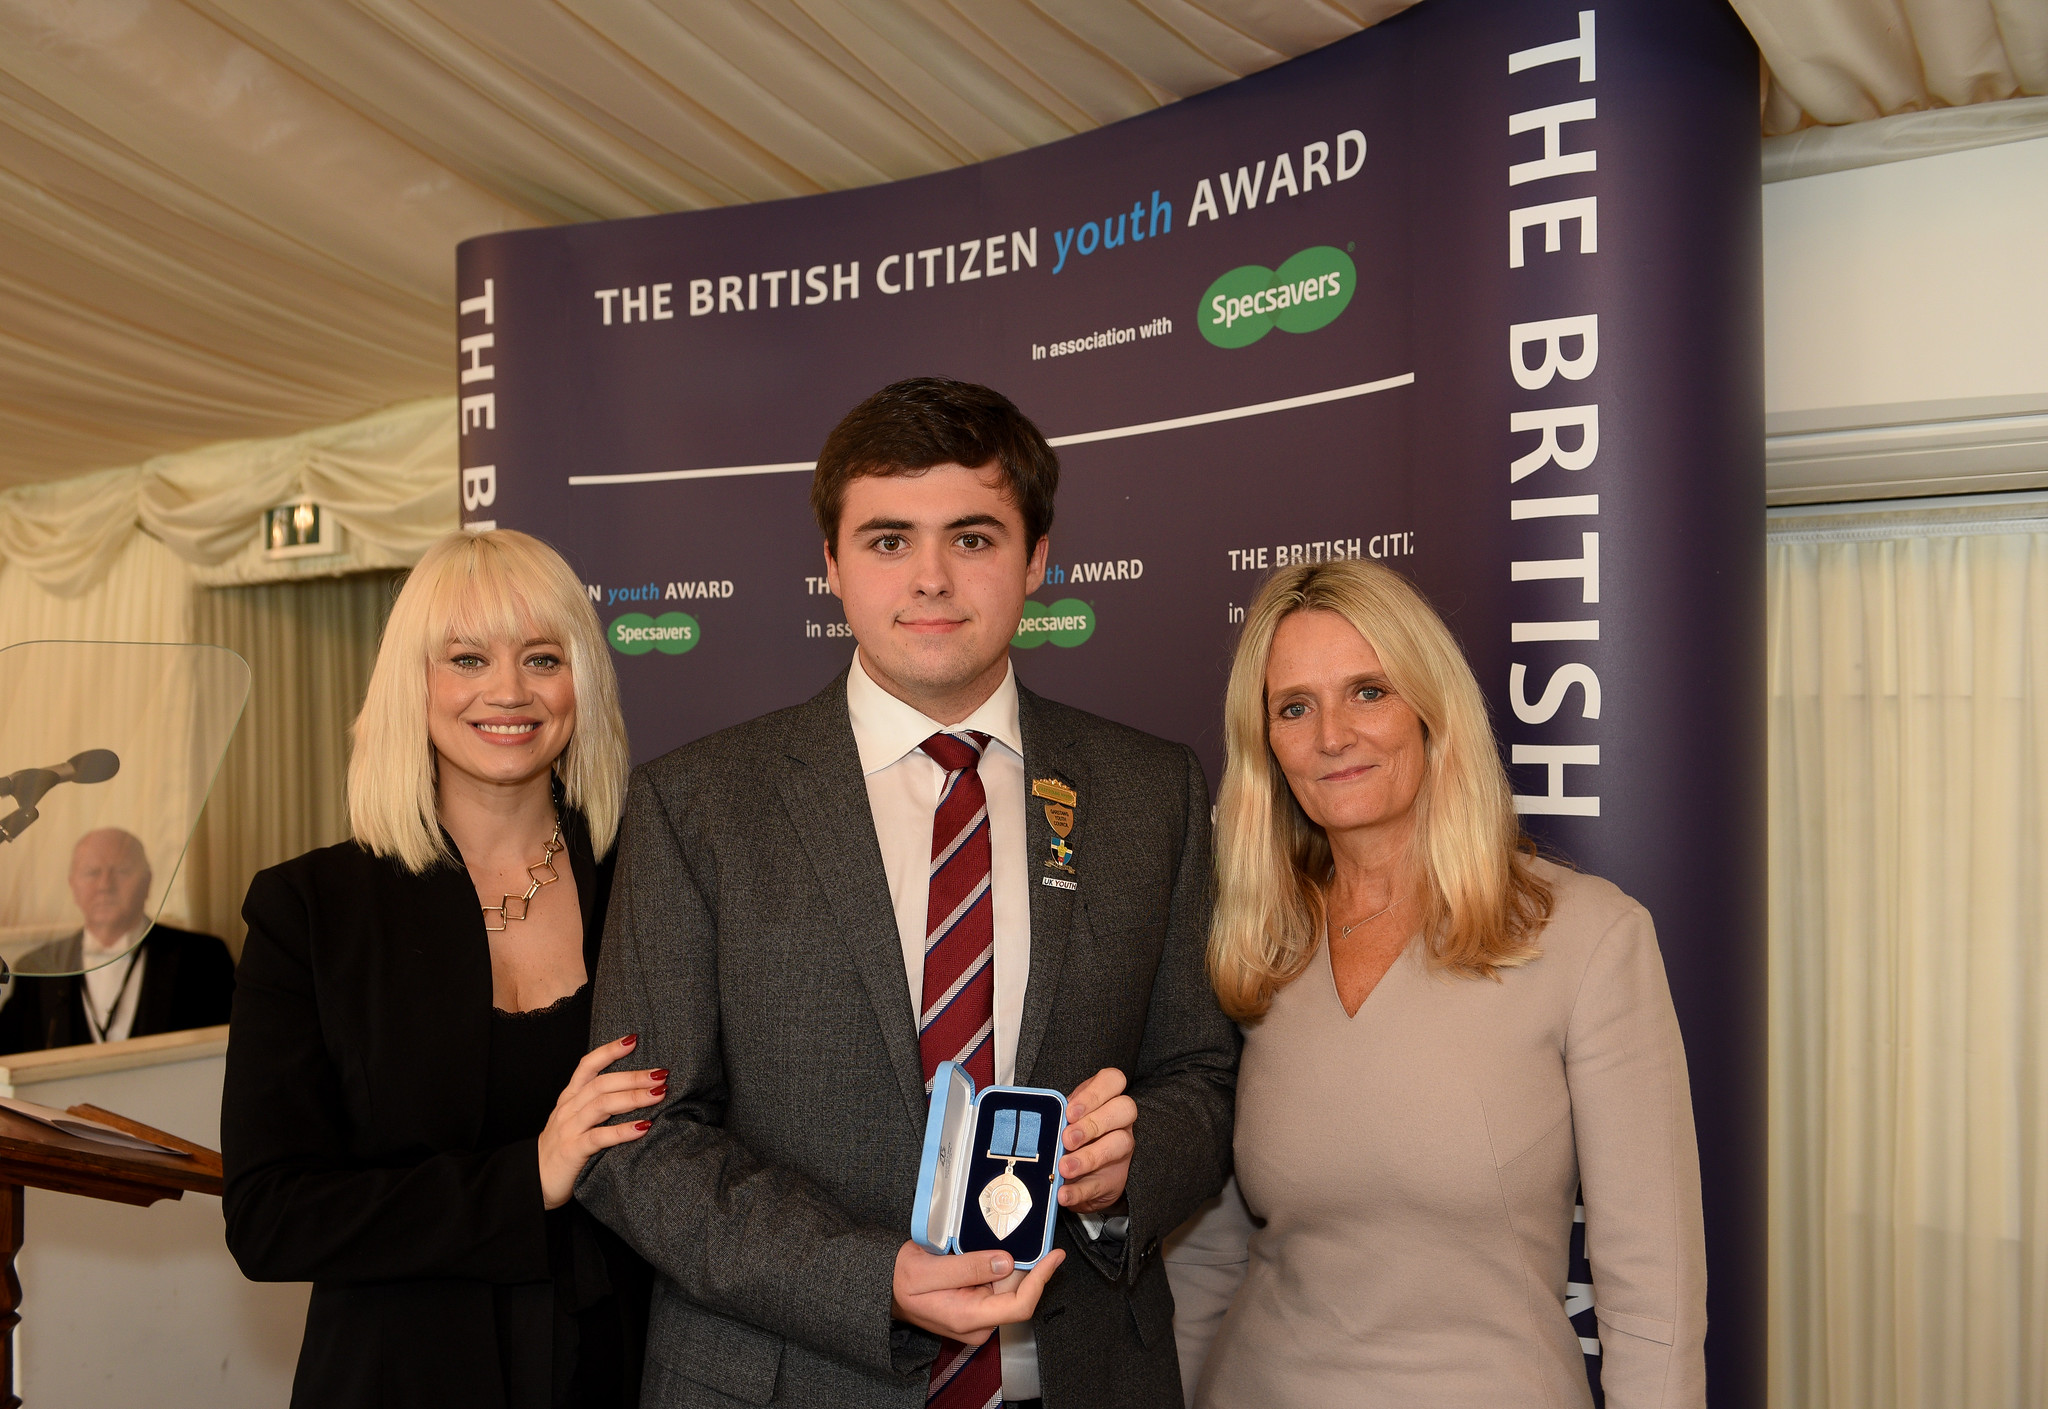 Kimberly Wyatt, Nathan Halford BCyA, Nicky Cox MBE, First News